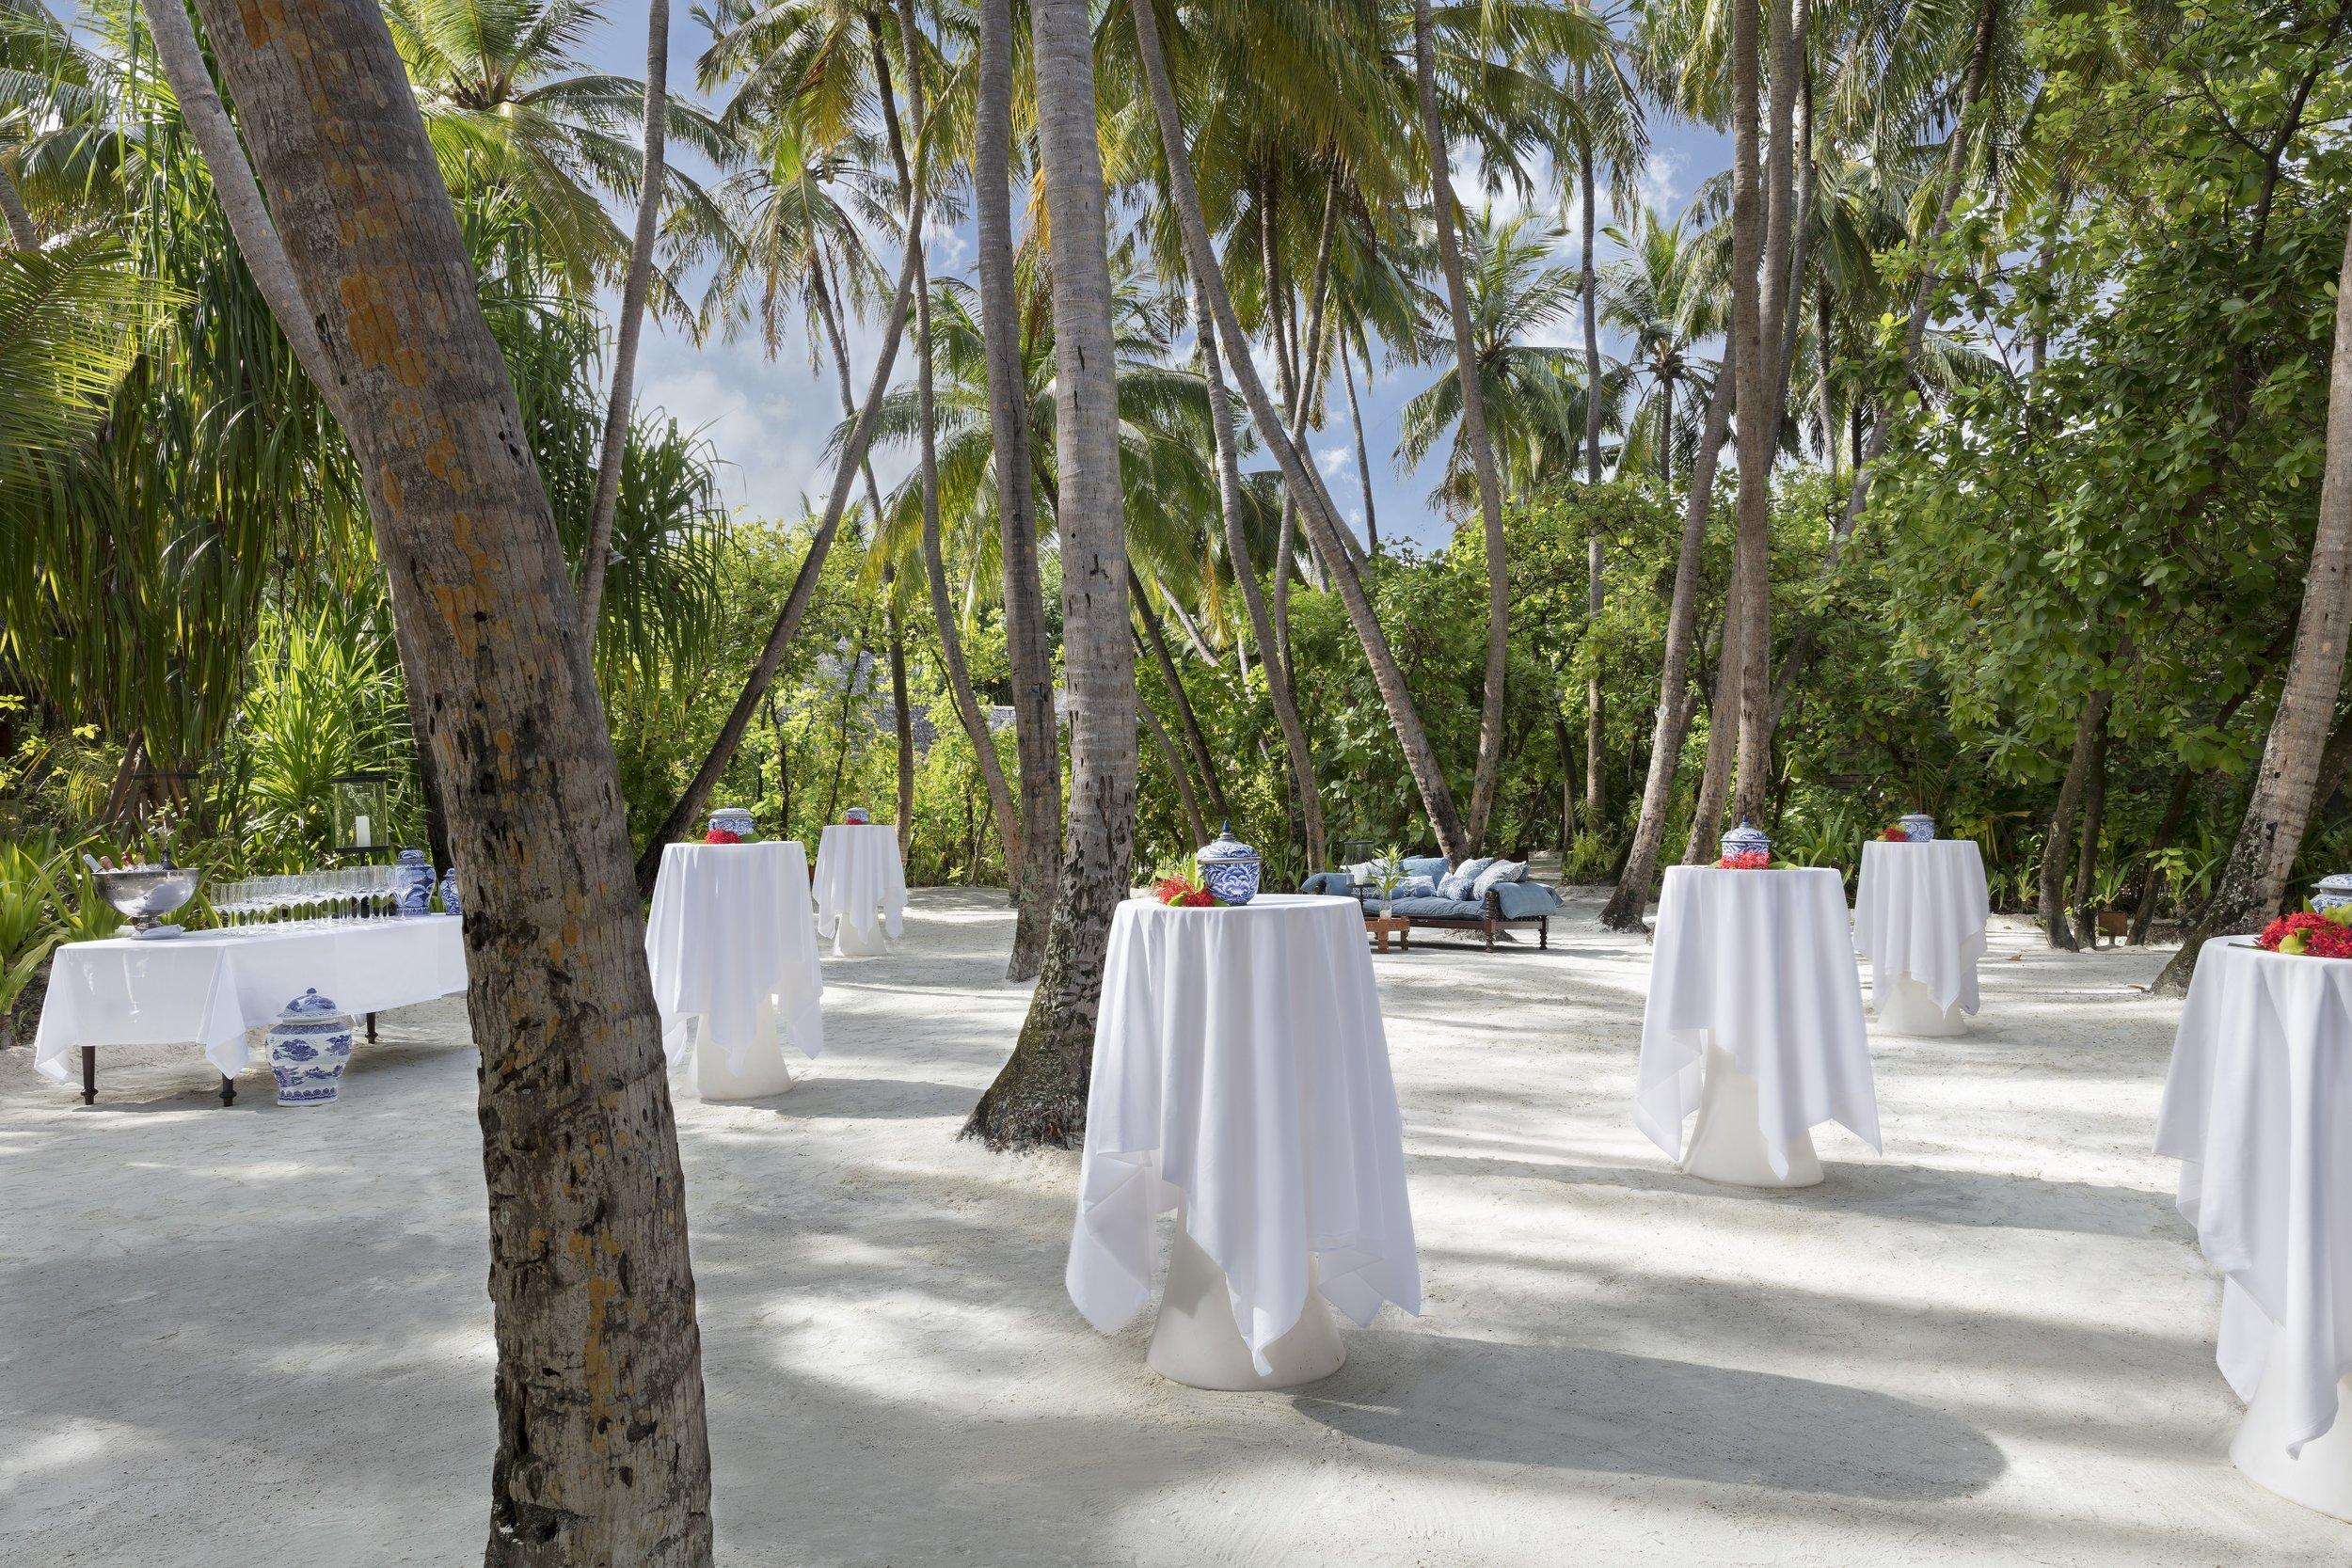 Naladhu_Private_Island_Coconut_Grove_Cocktail_Party.jpg